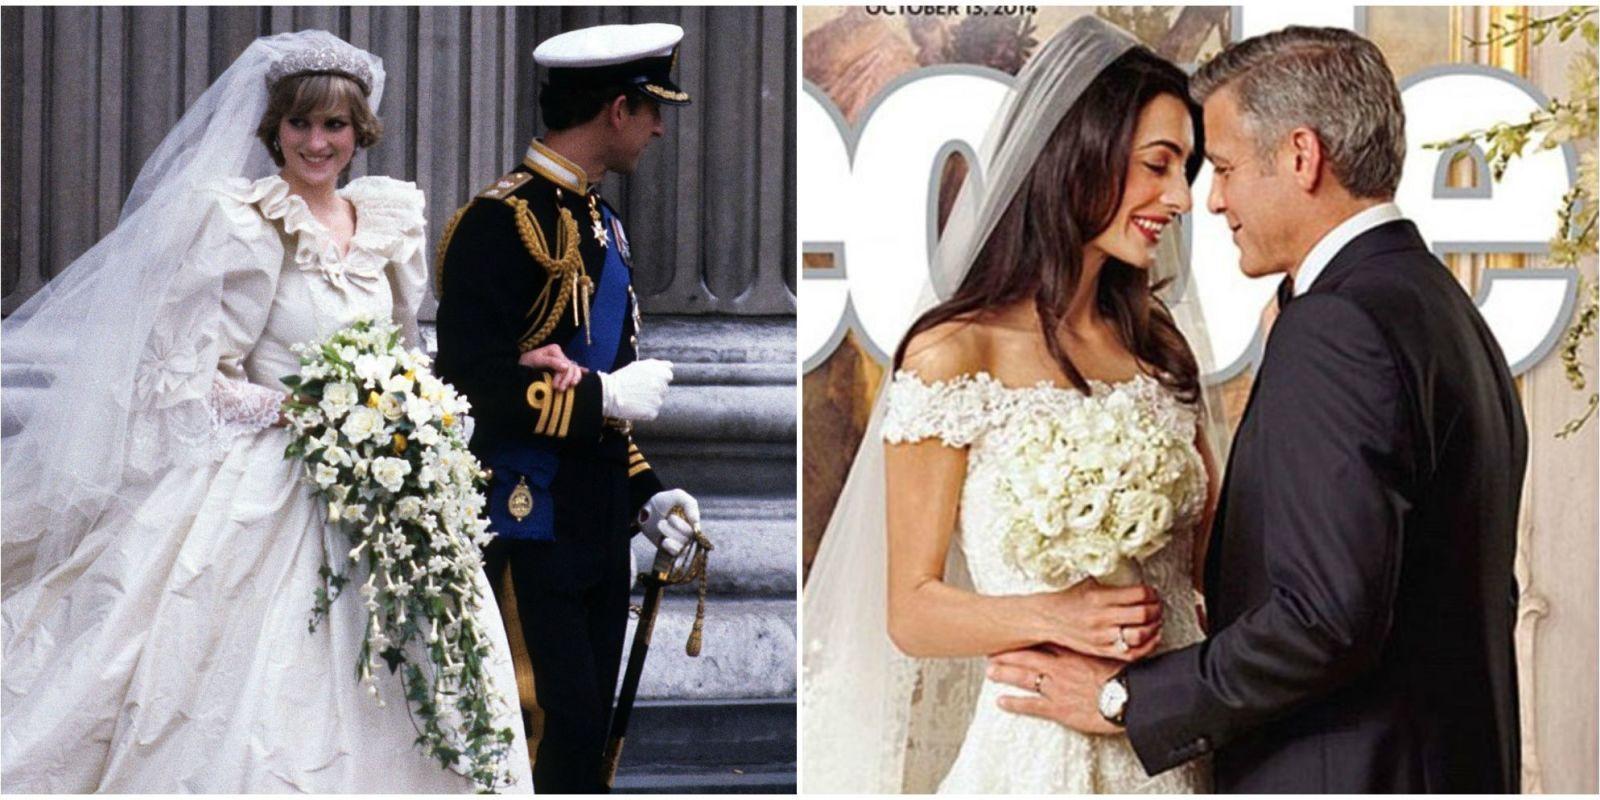 Most Revealing Wedding Dresses